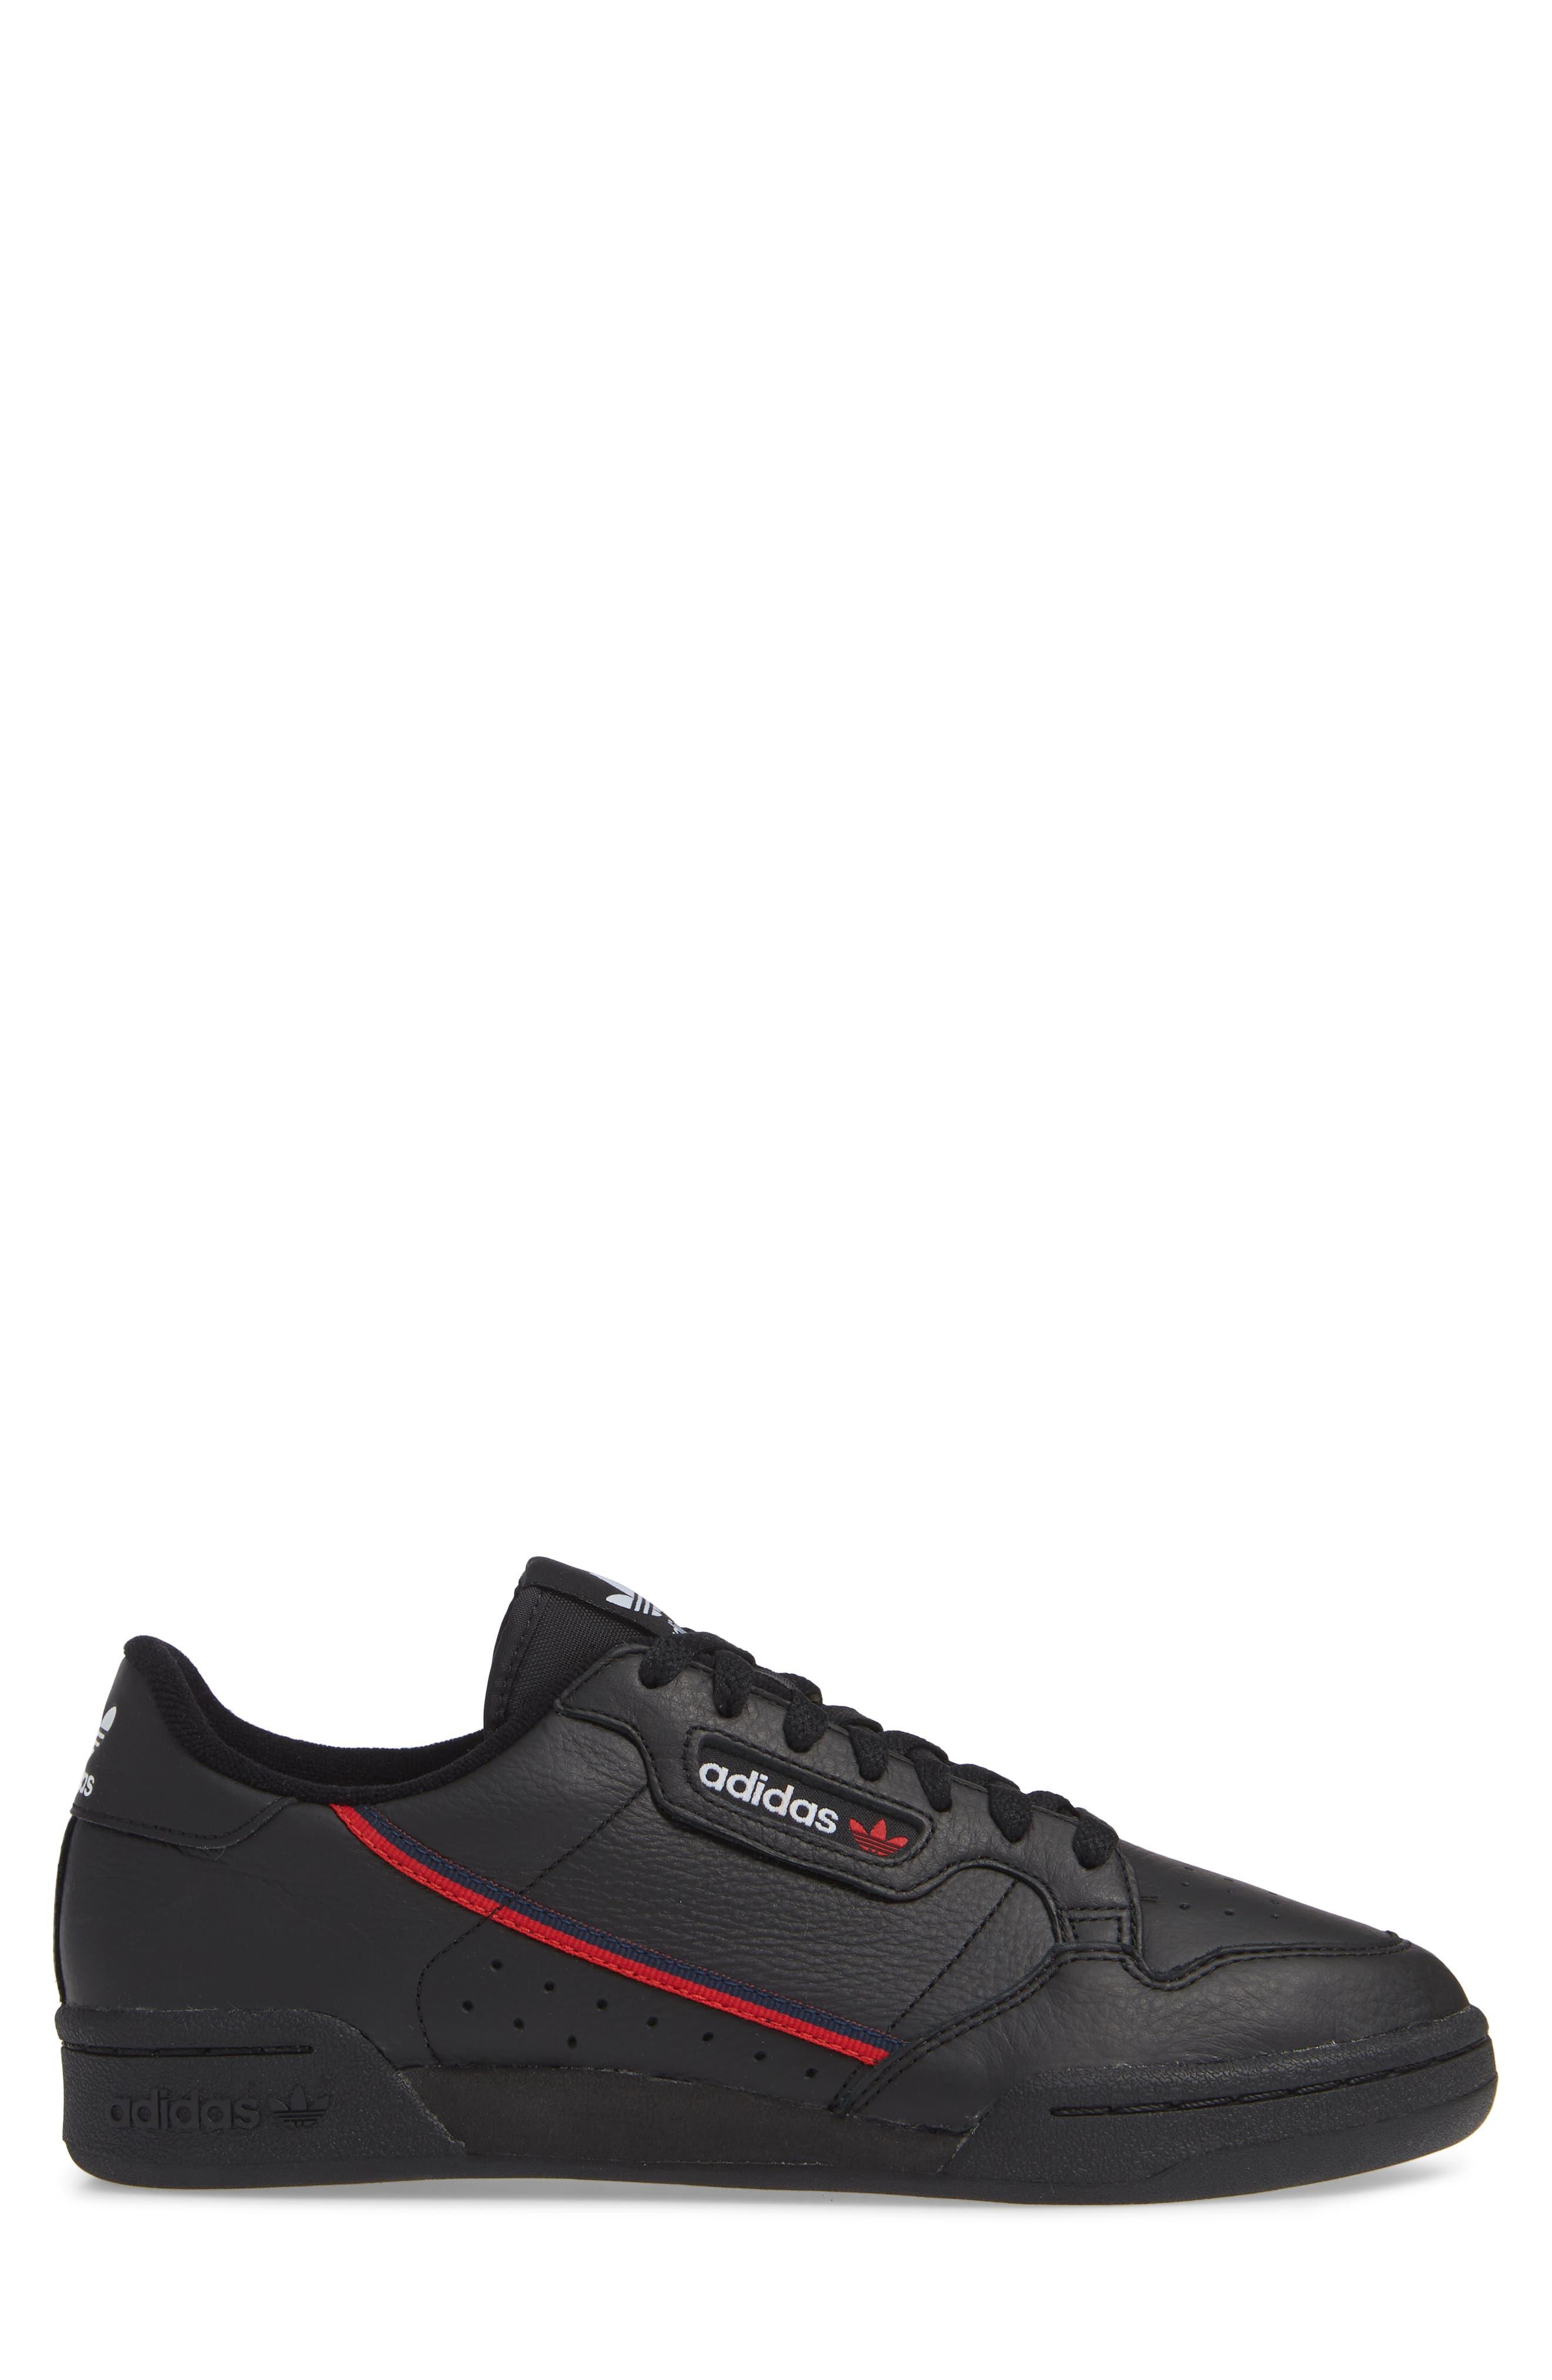 Continental 80 Sneaker,                             Alternate thumbnail 3, color,                             BLACK/ SCARLET/ NAVY